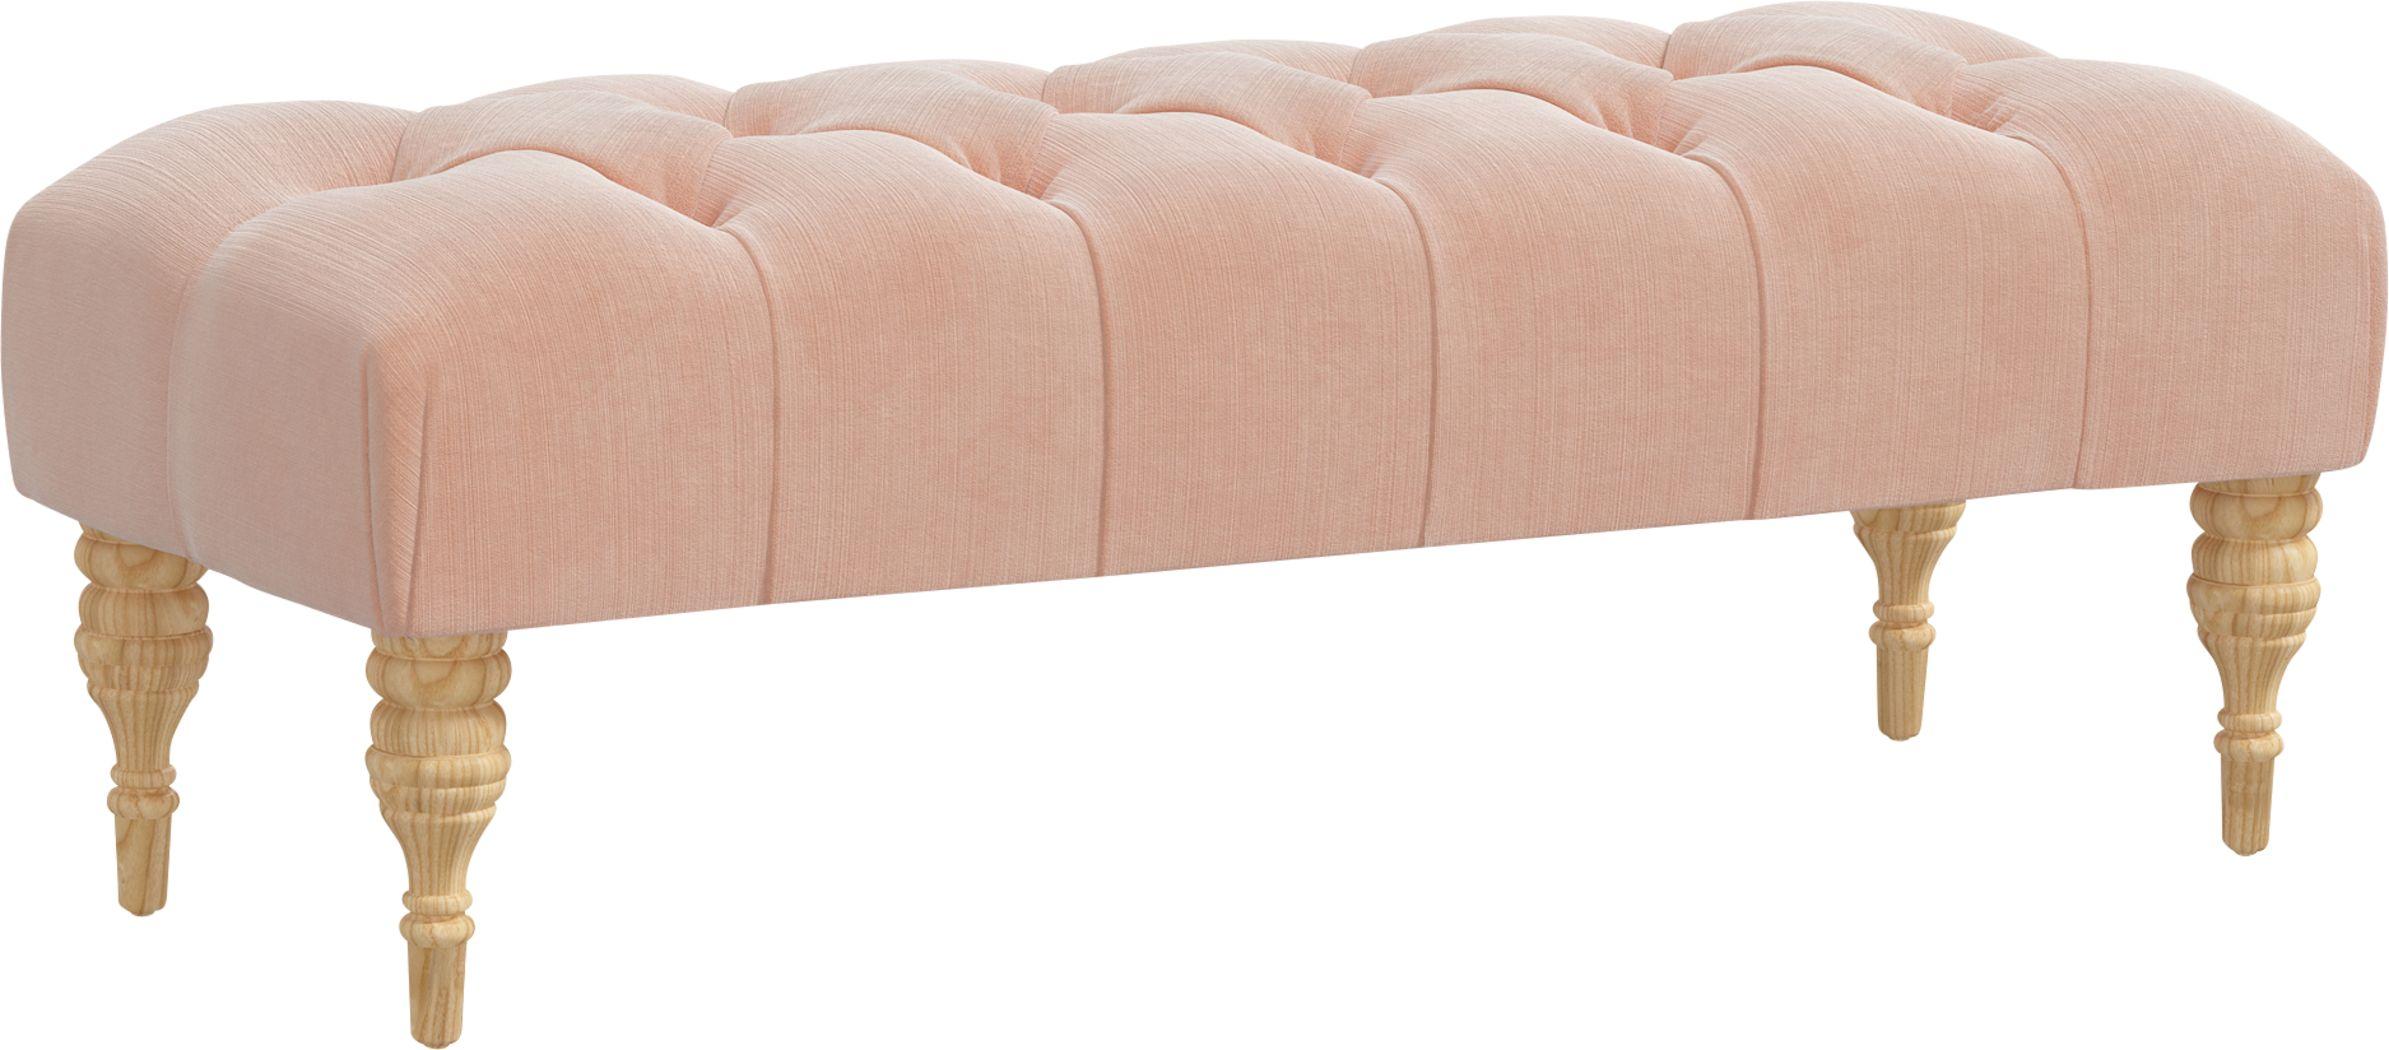 Aquaflor Pink Bench